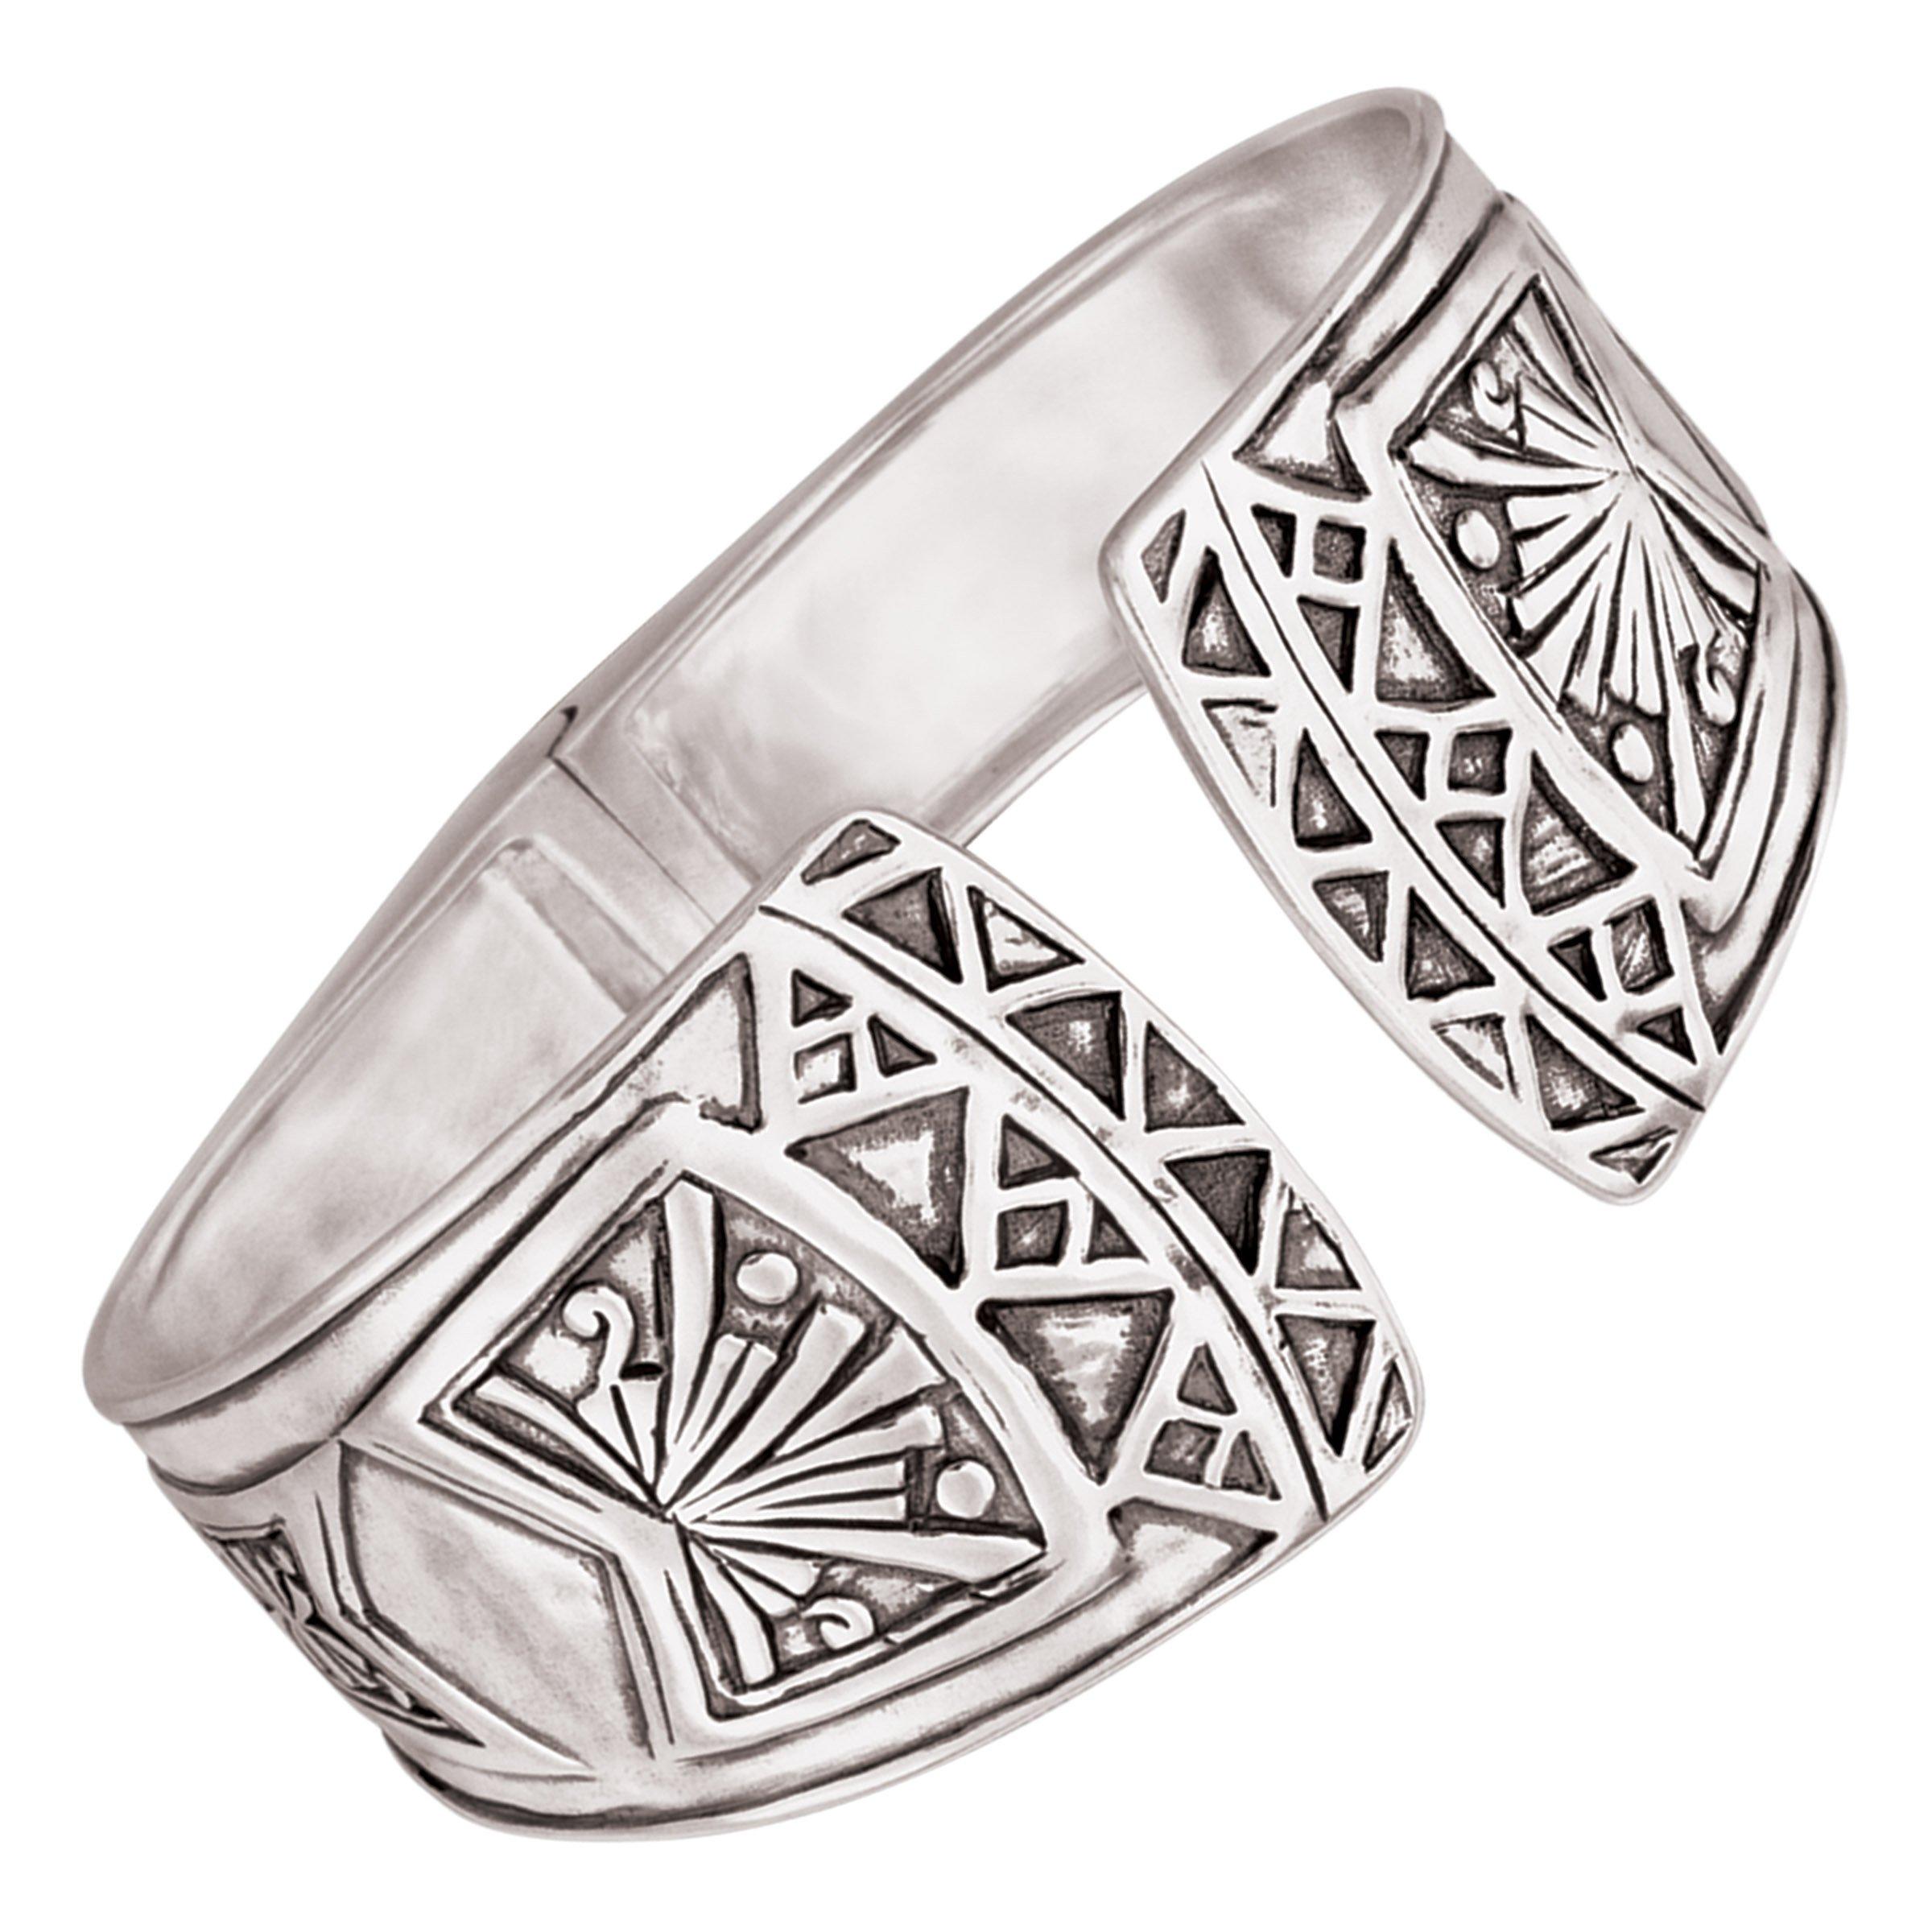 Silpada 'Willow Hinge' Sterling Silver Cuff Bracelet, 6.5''